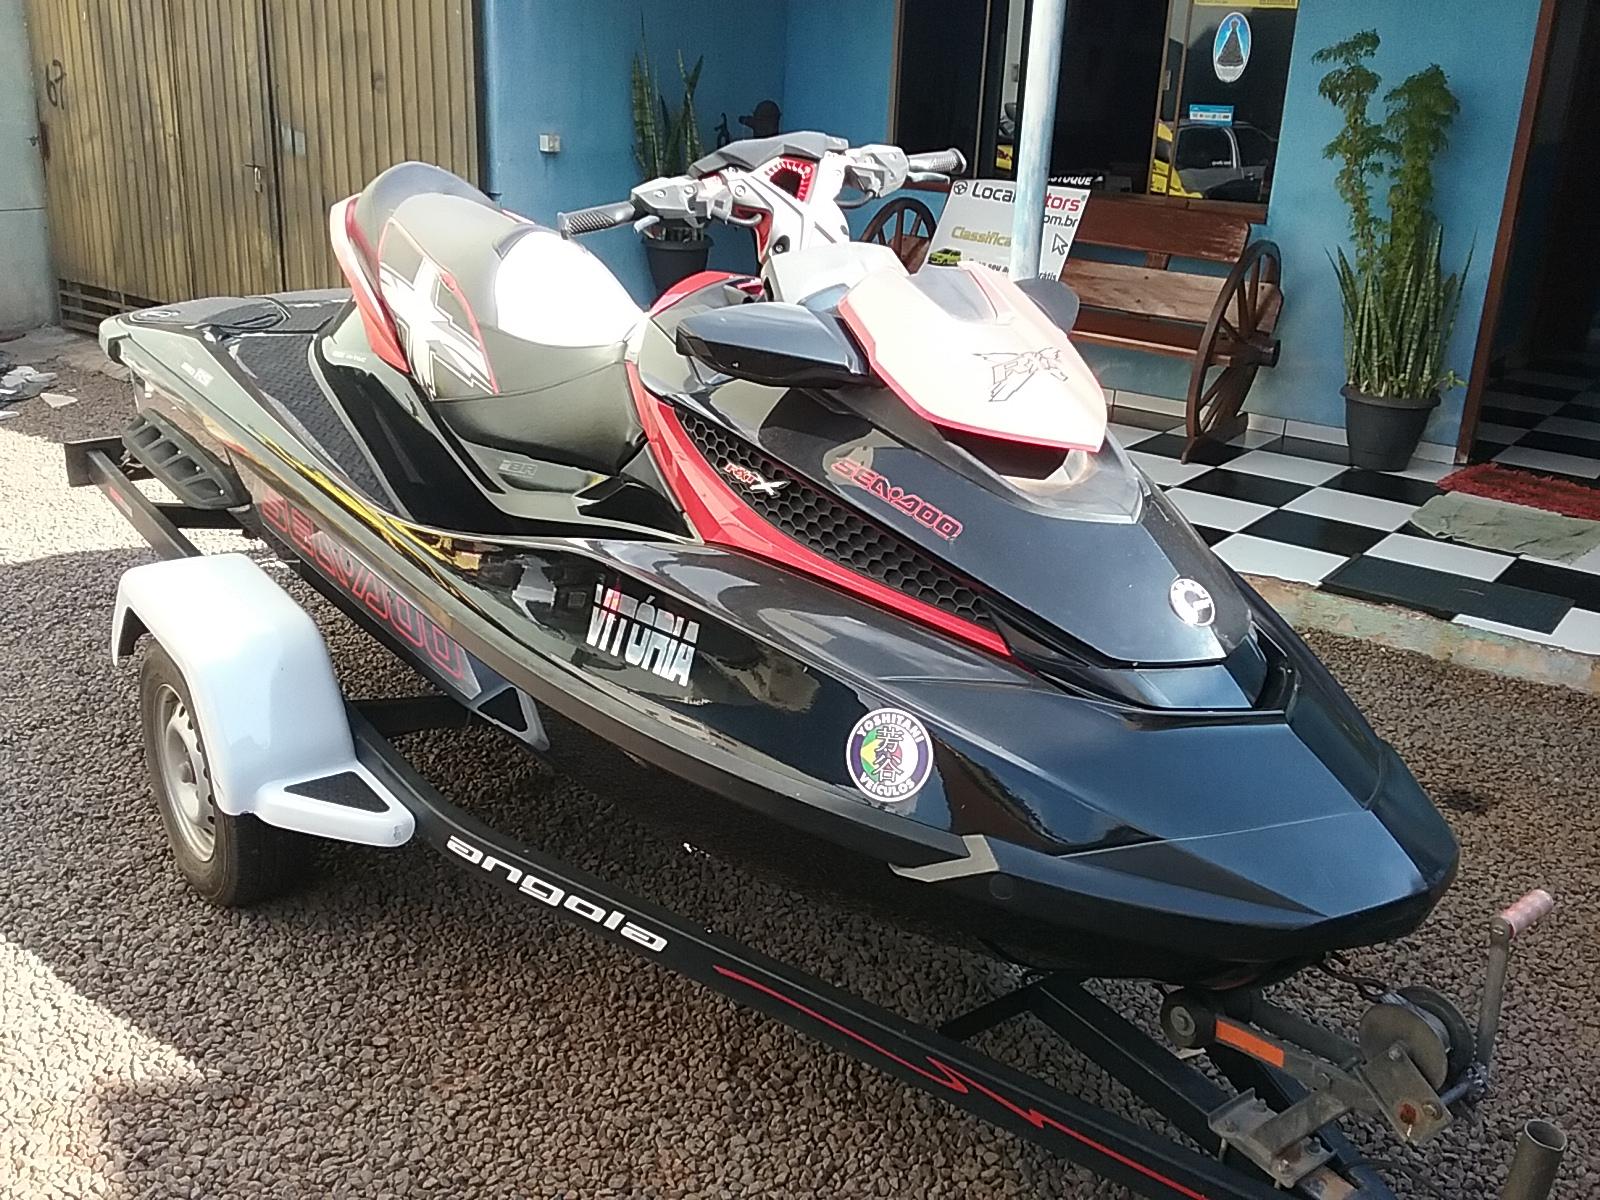 Jet Ski Sea Doo RXT 260 Turbo 2011